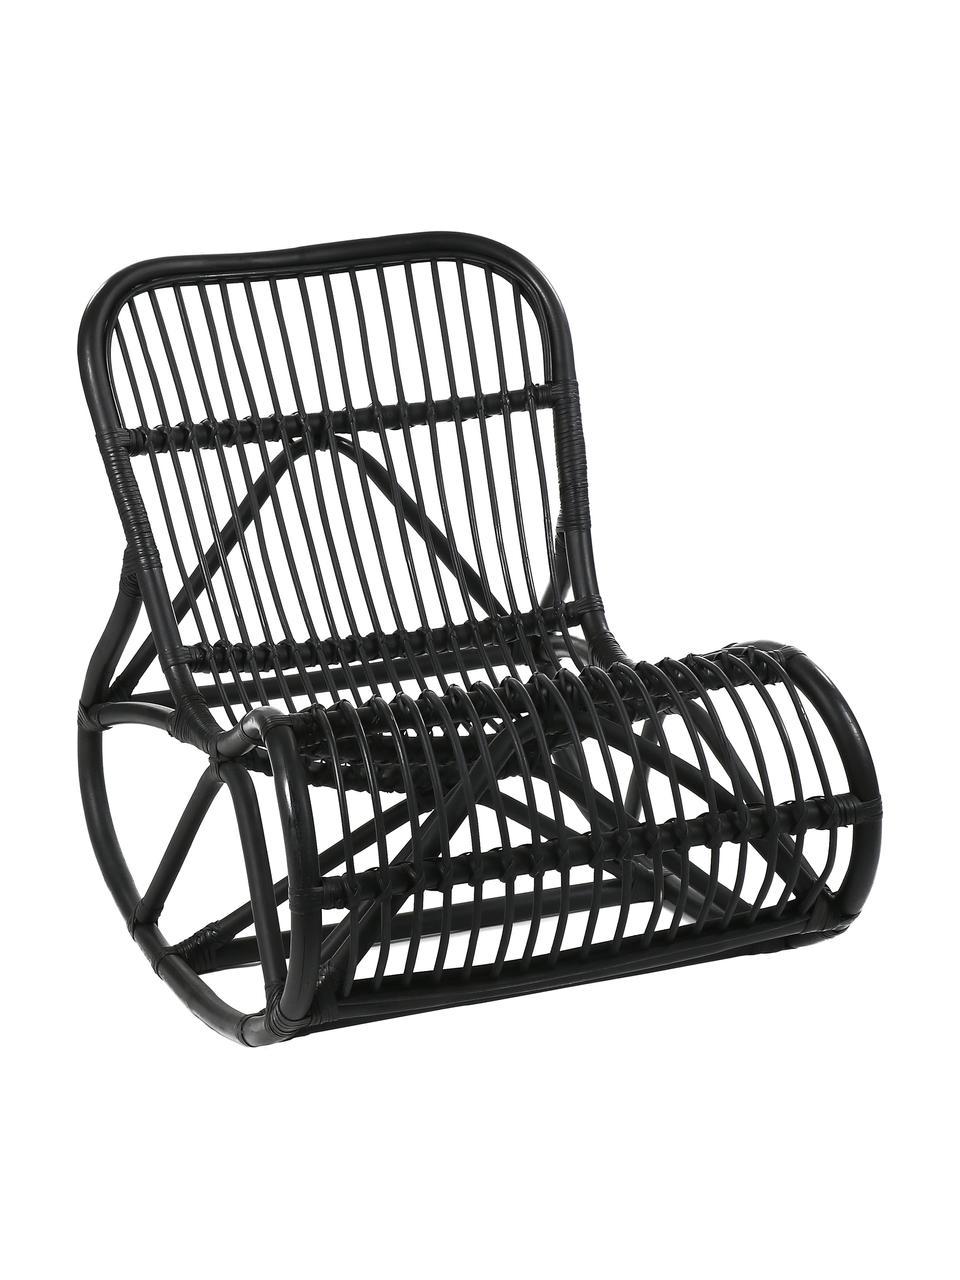 Rotan schommelstoel Kim  in zwart, Rotan, Zwart, 62 x 90 cm